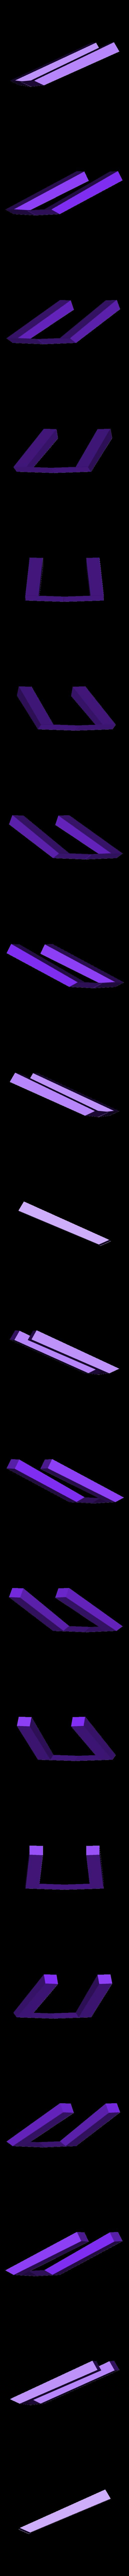 brownNeckPart.stl Download STL file Fortnite LLama • 3D print template, EliGreen